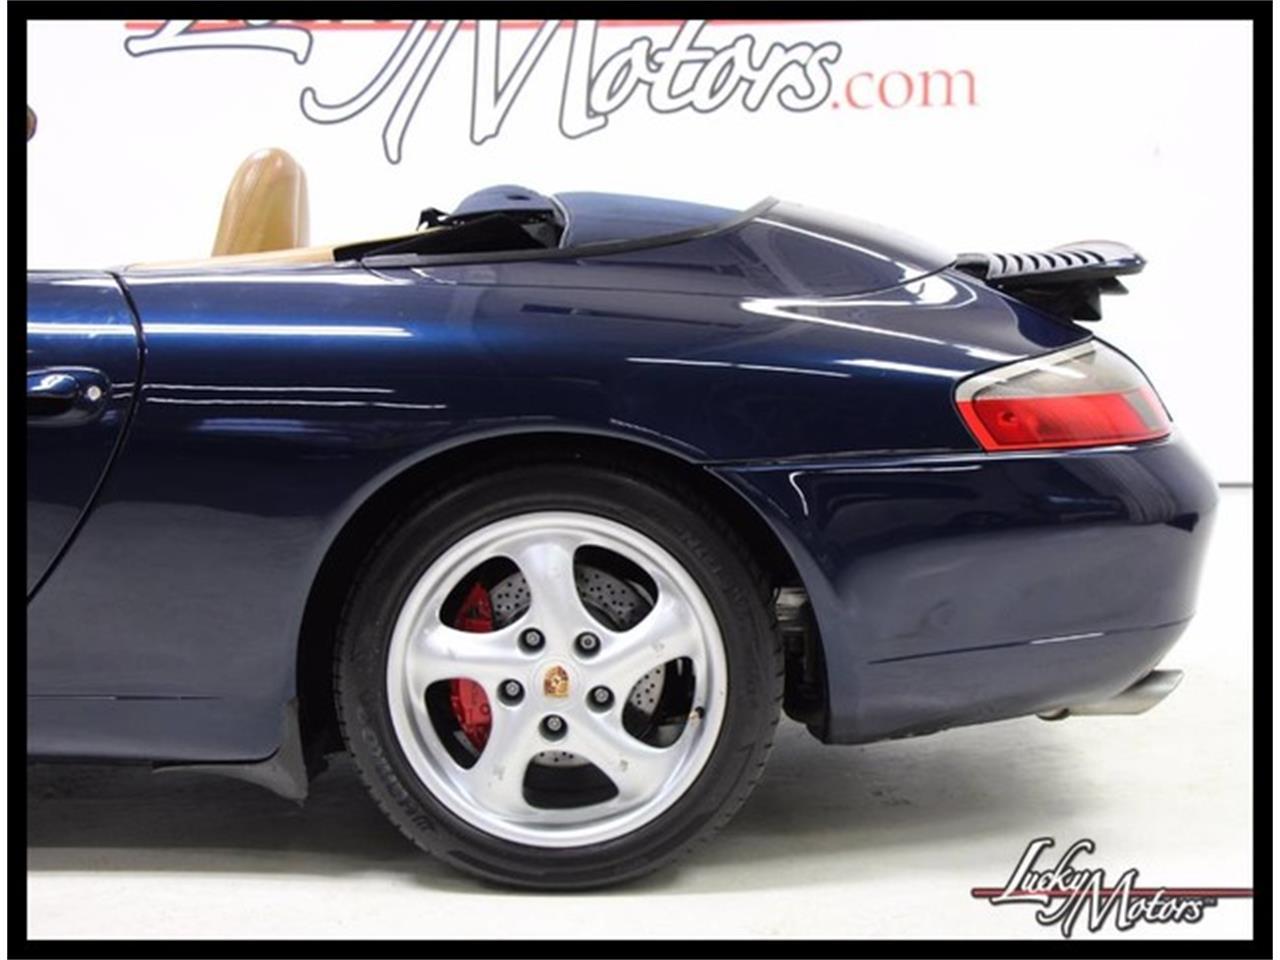 Large Picture of 1999 Porsche 911 Carrera located in Elmhurst Illinois - $14,990.00 - M482